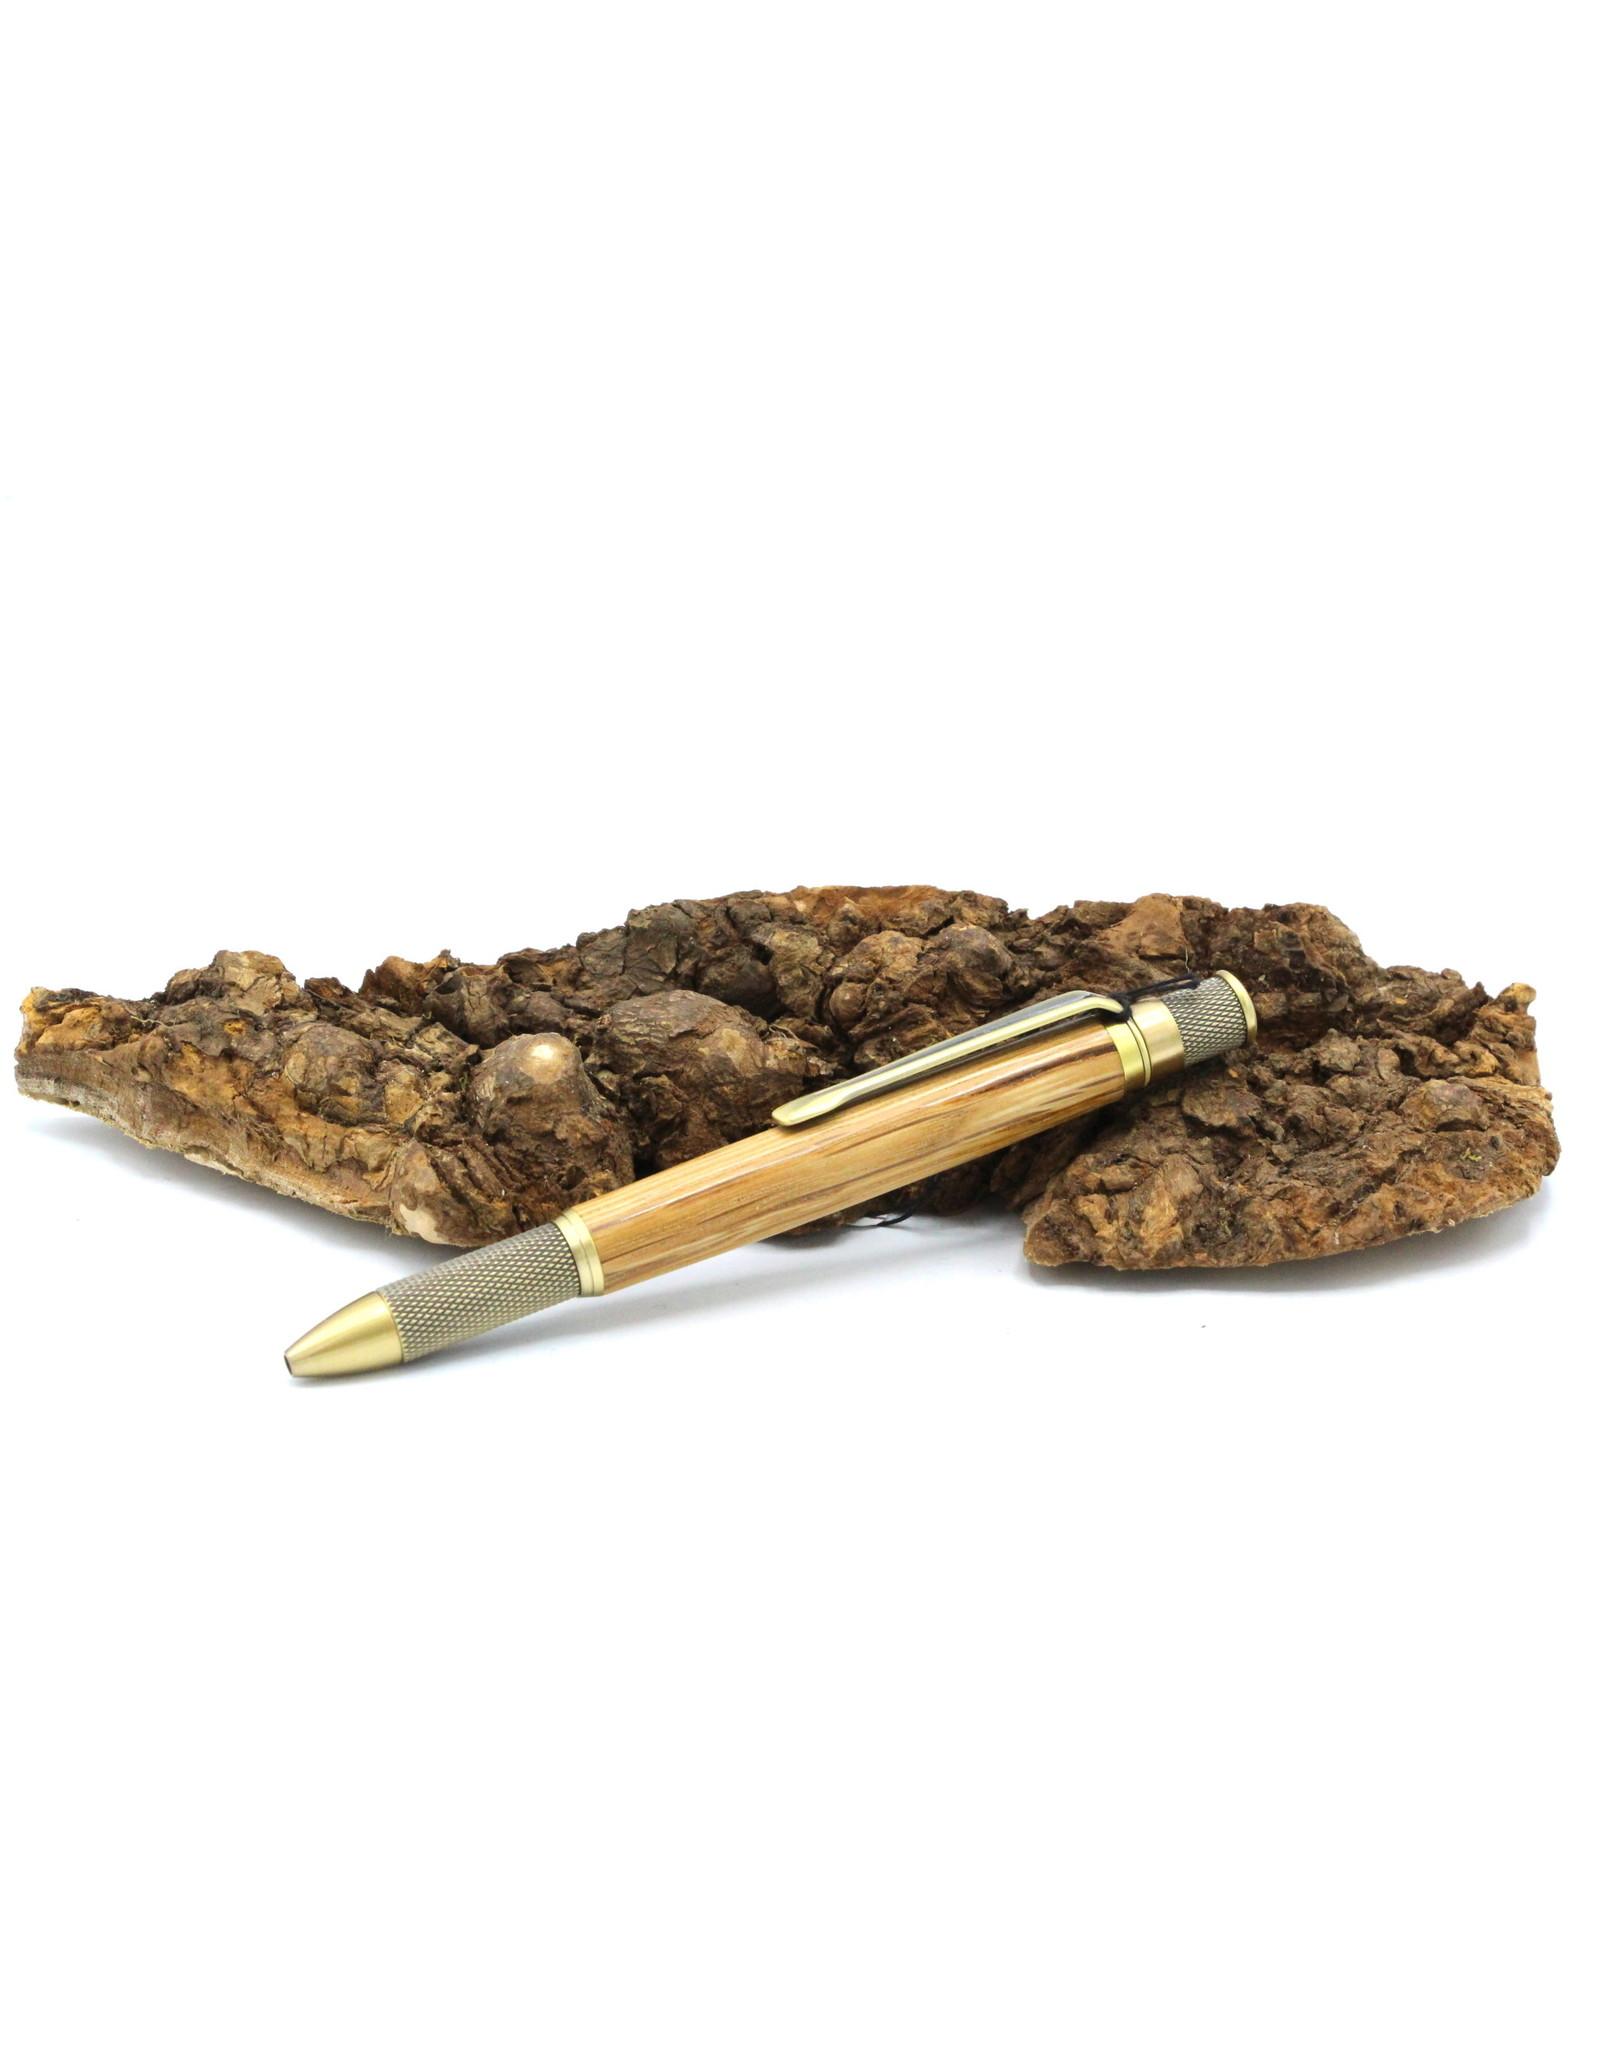 Maple Pen - Gizona Jack Daniel Brass